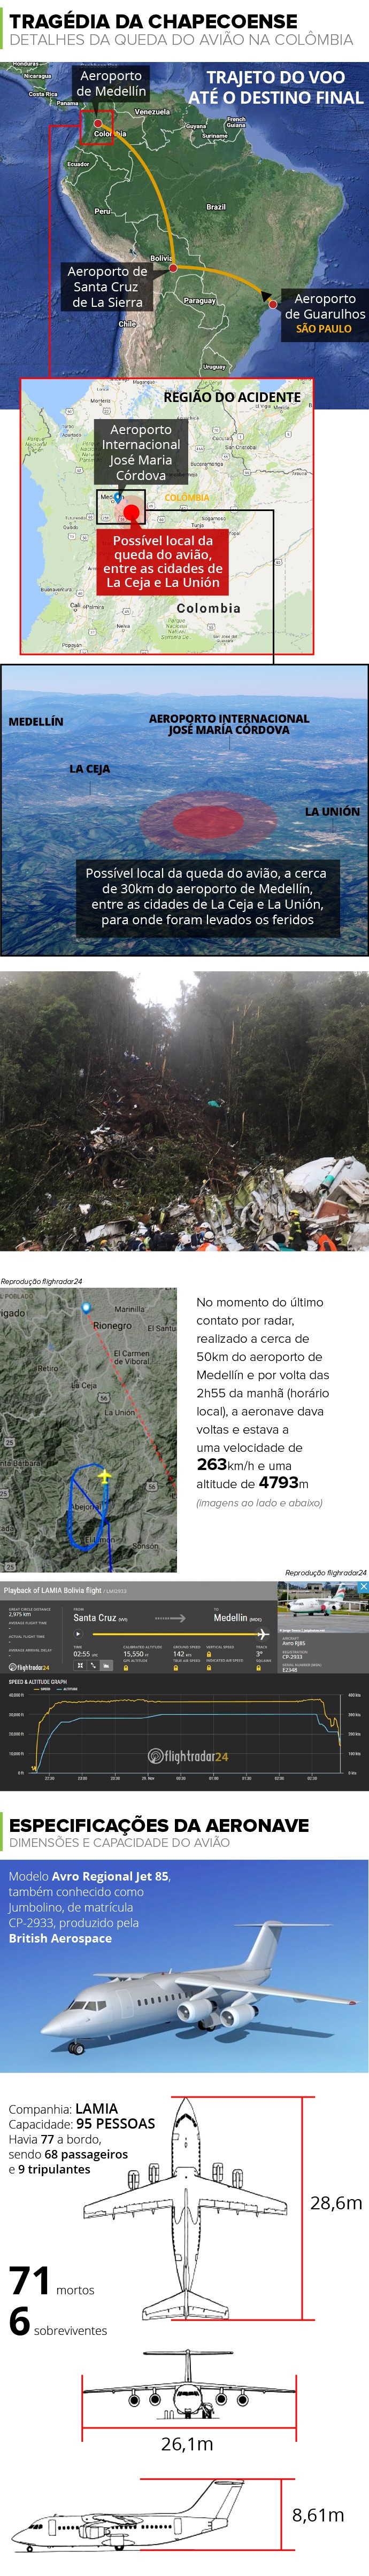 Info QUEDA AVIAO Chapecoense J (Foto: infoesporte)